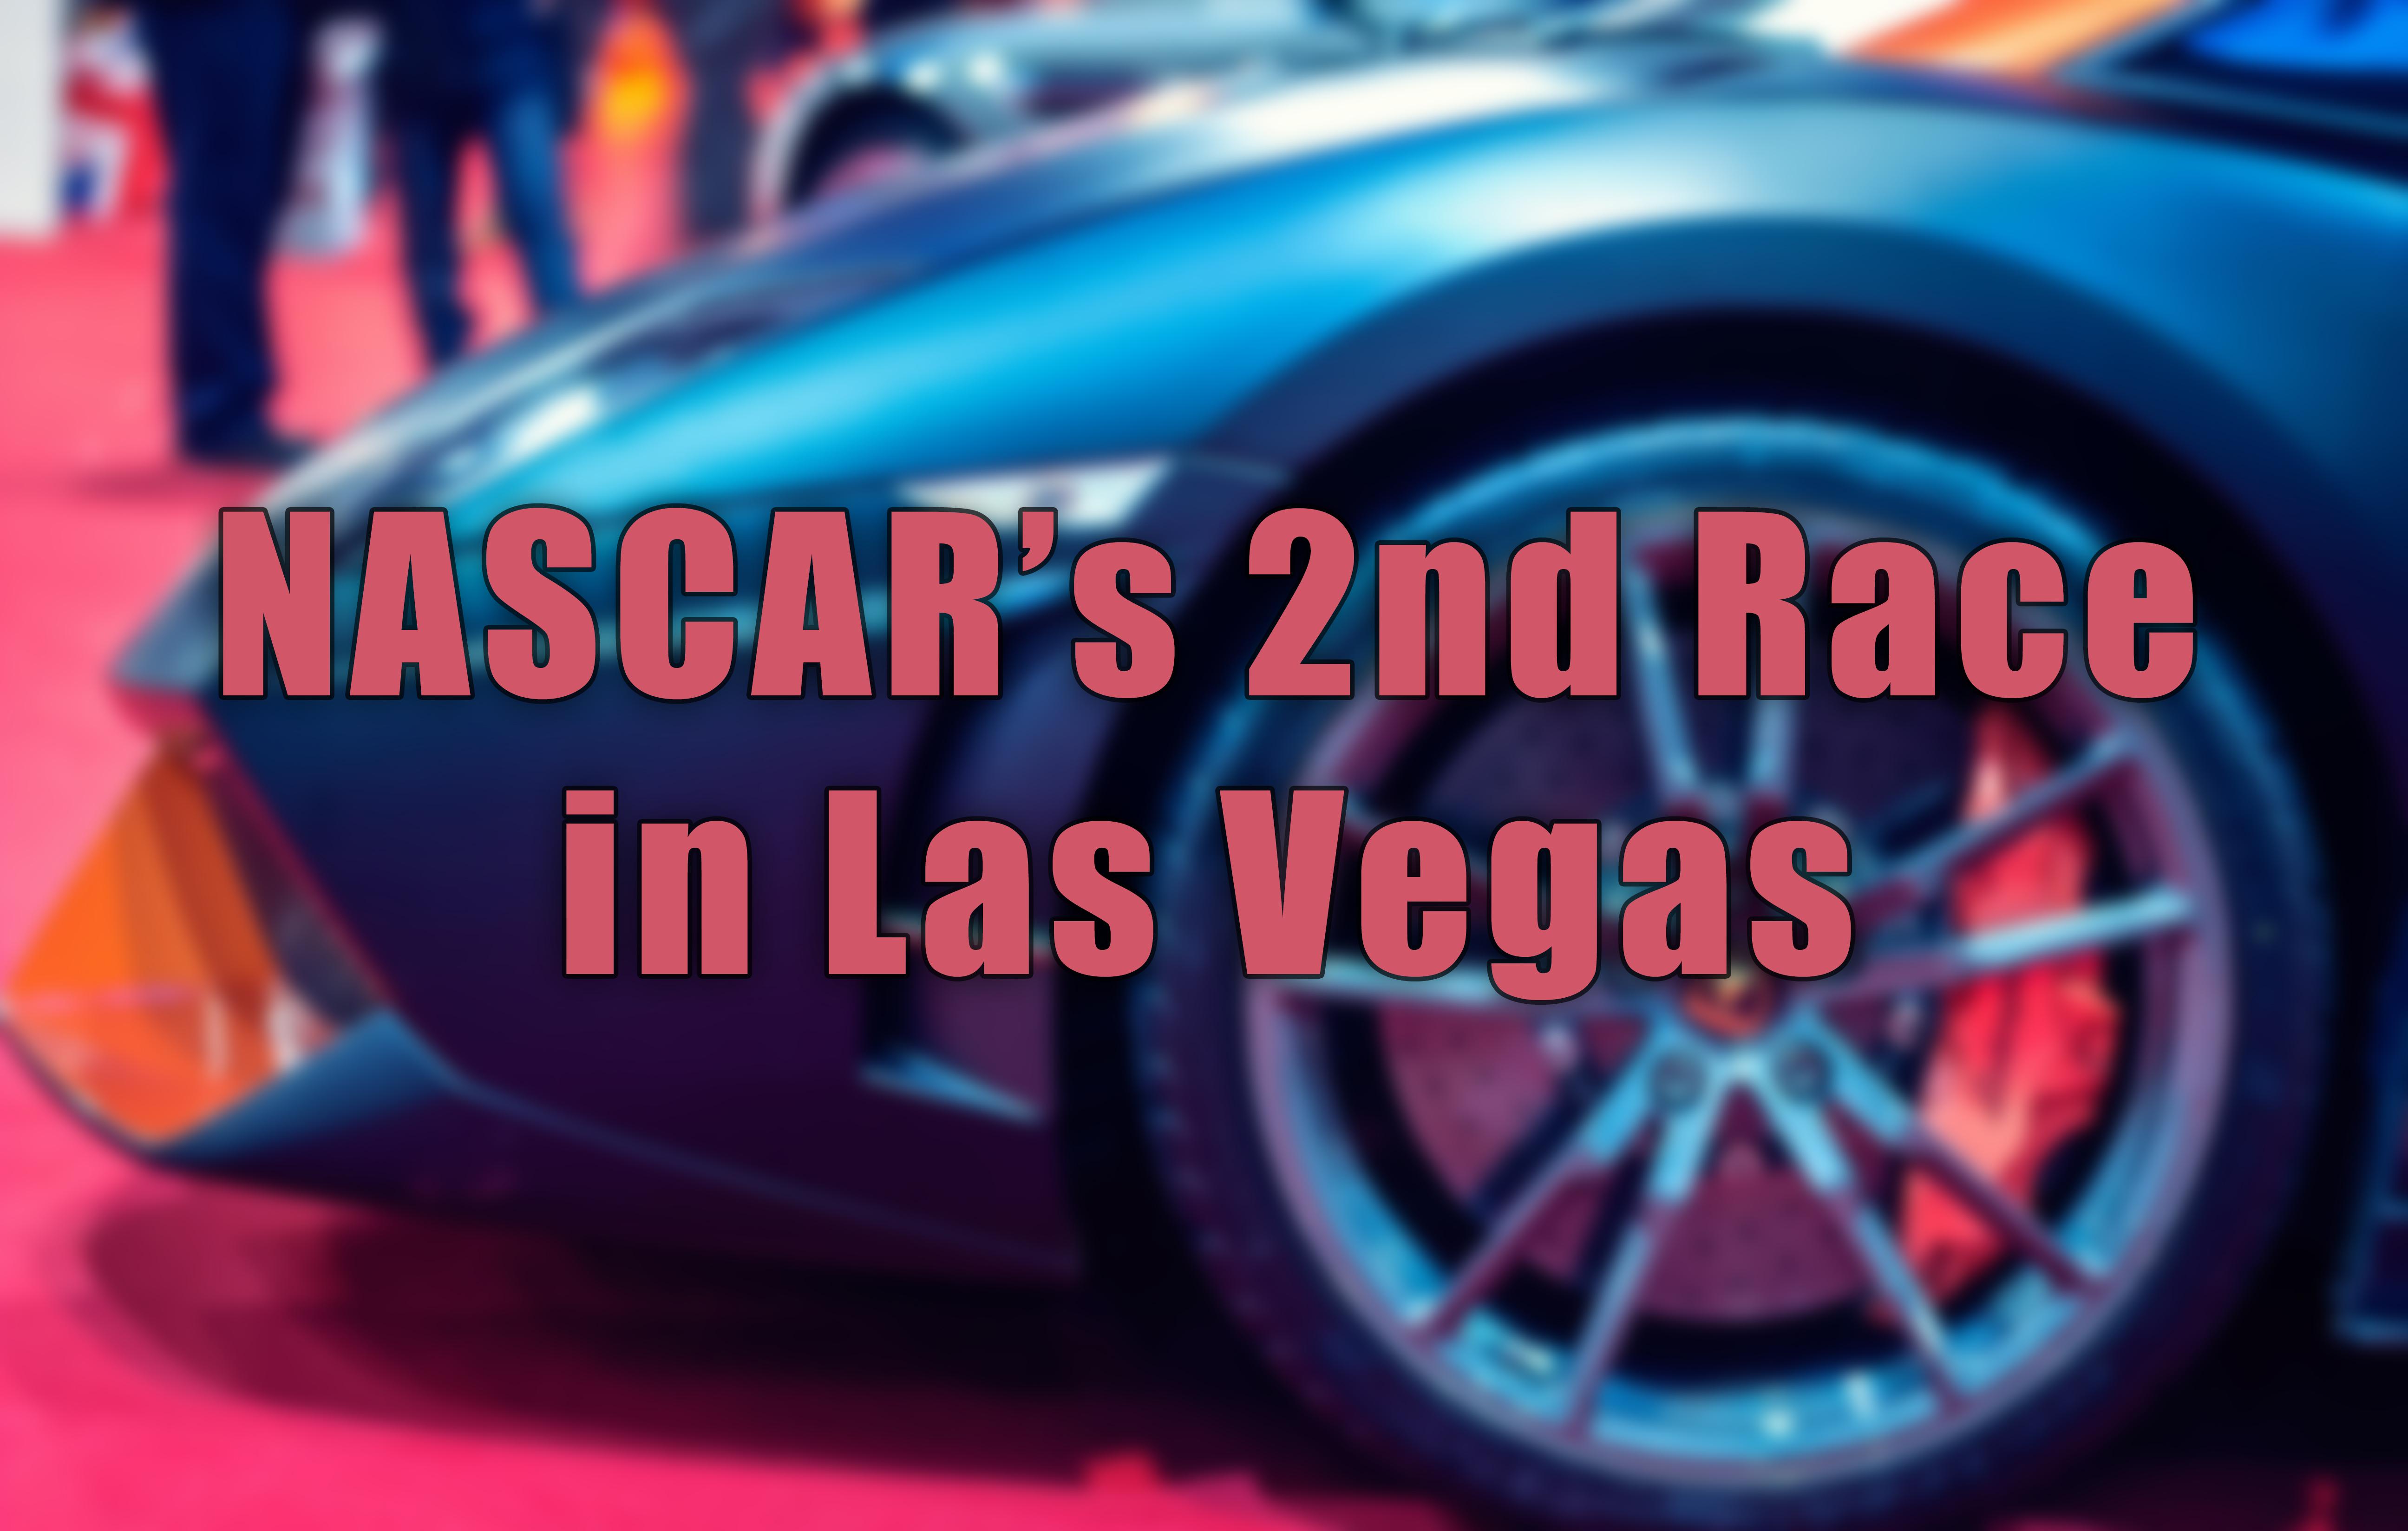 Nascar's 2nd Race.jpg